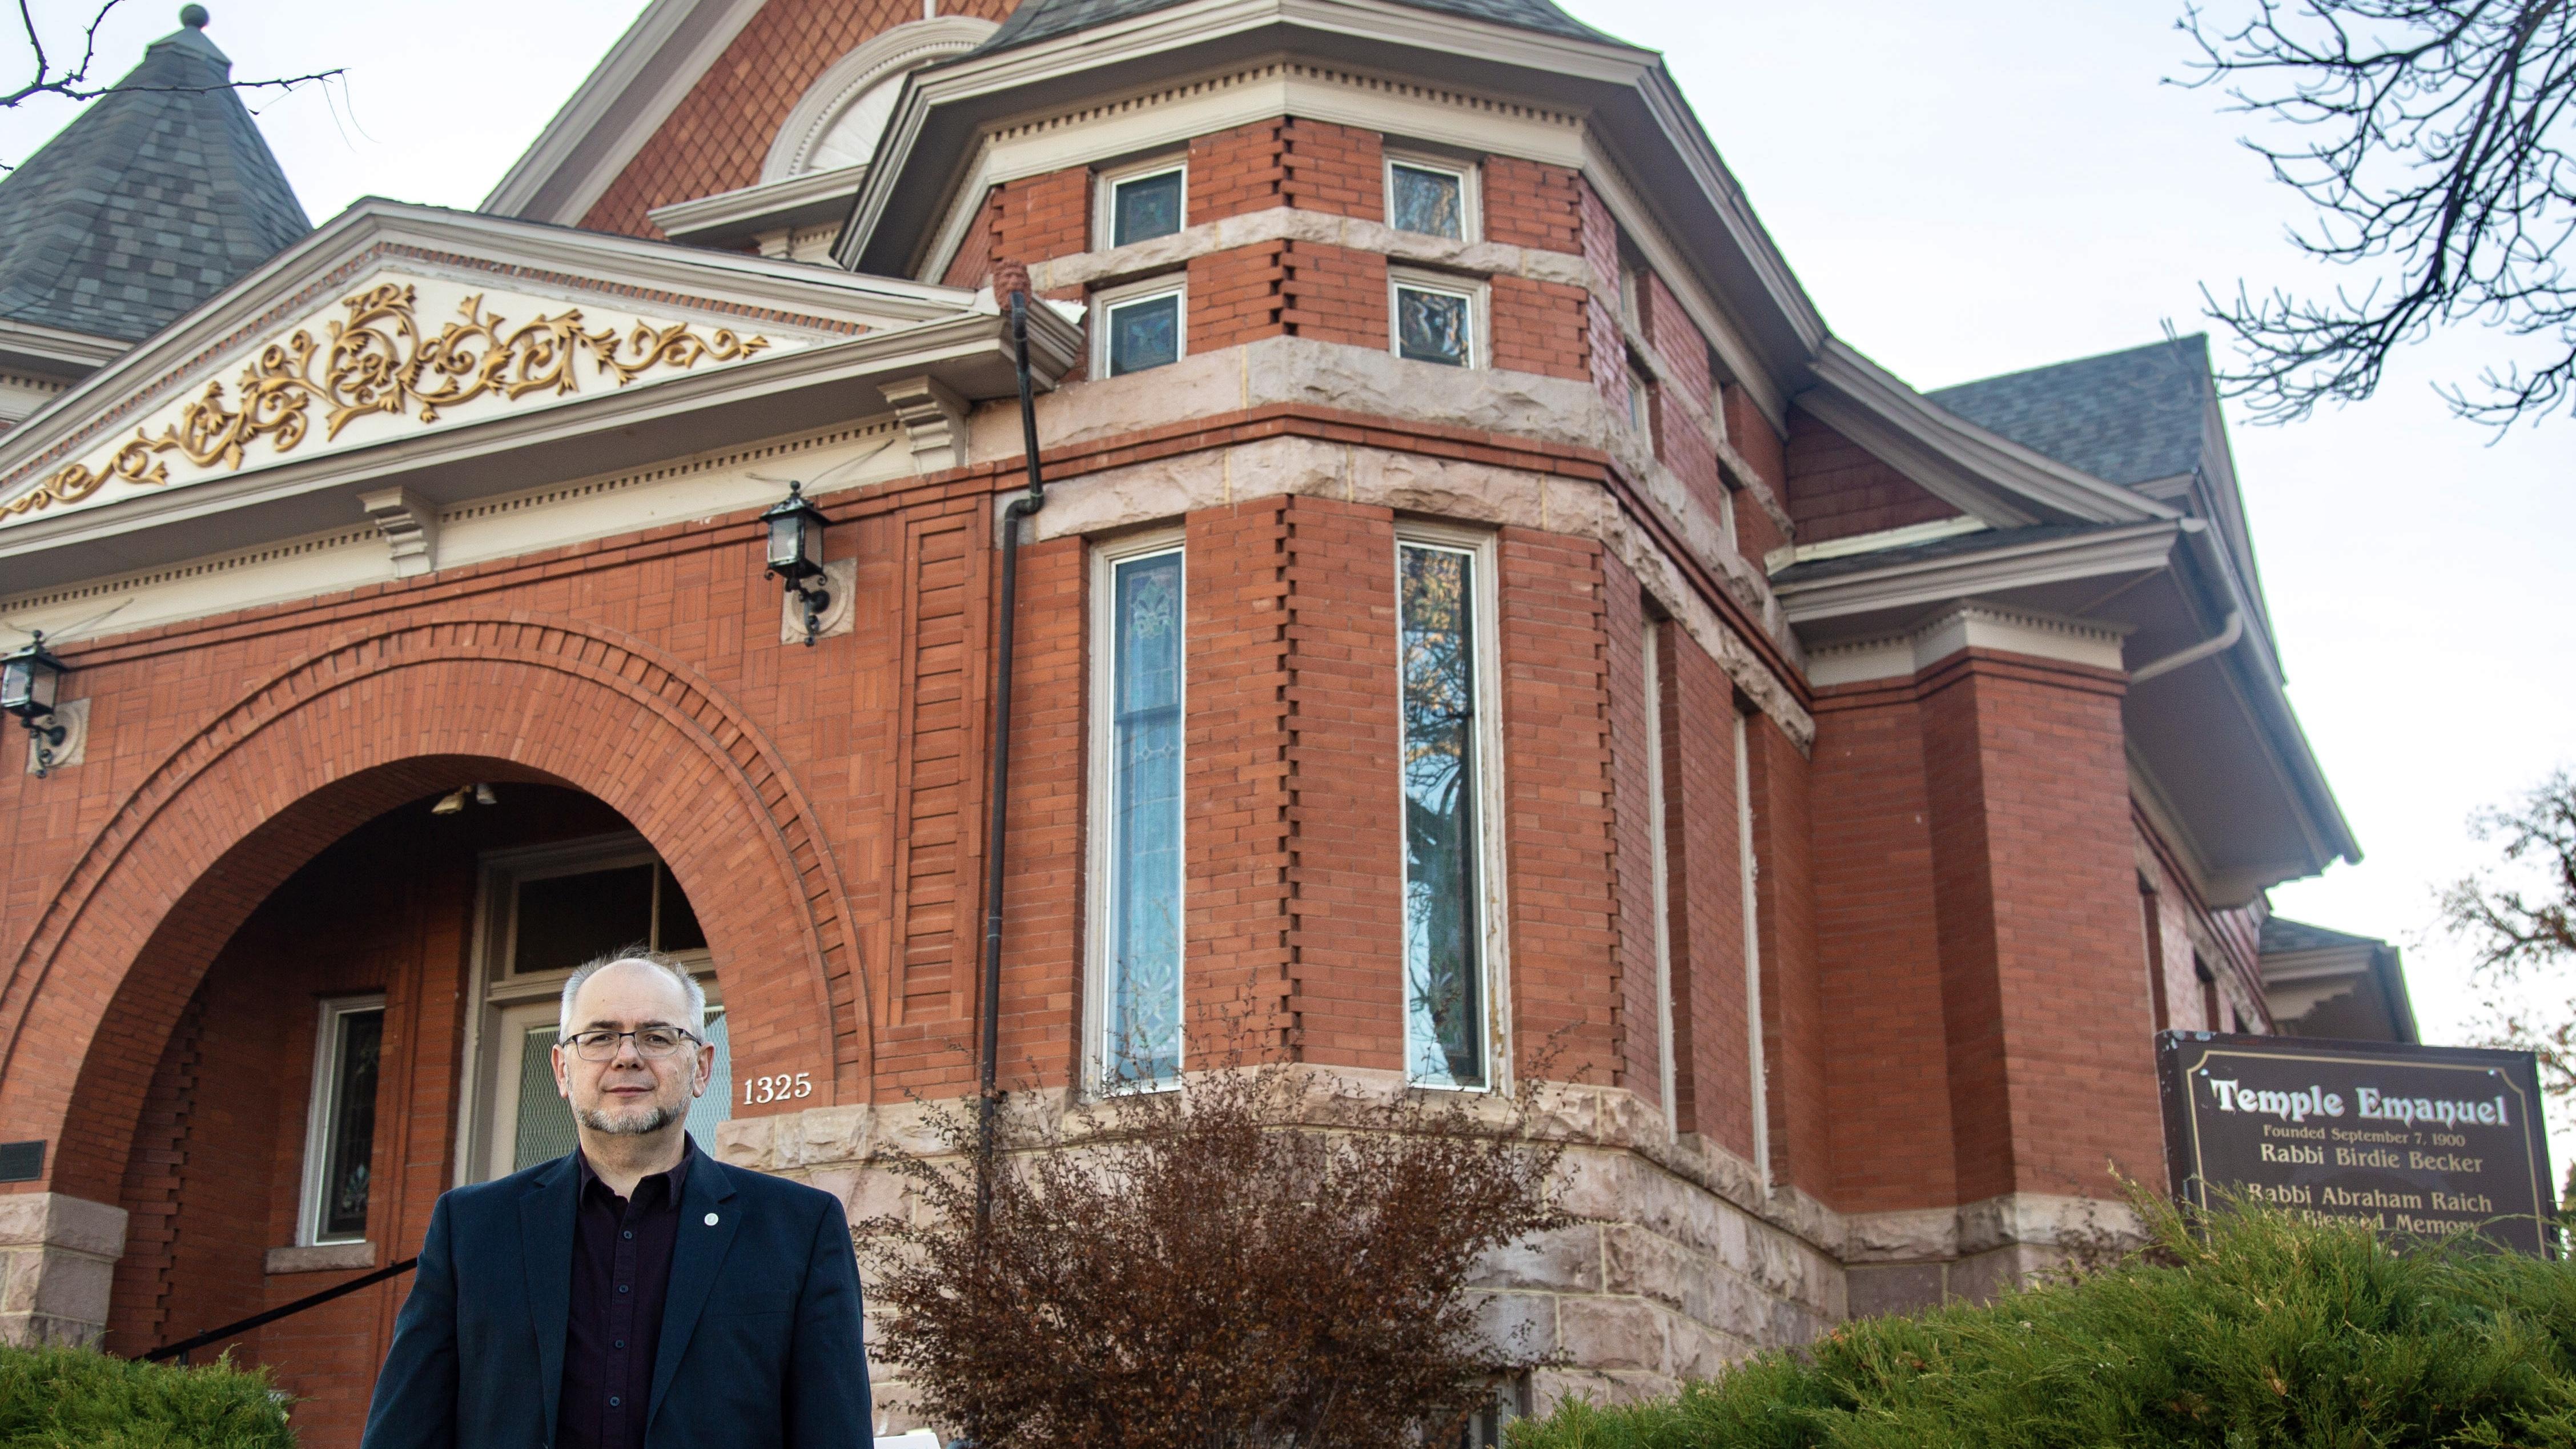 Pueblo Adventists Condemn Planned White Supremacist Attack on Jewish Temple